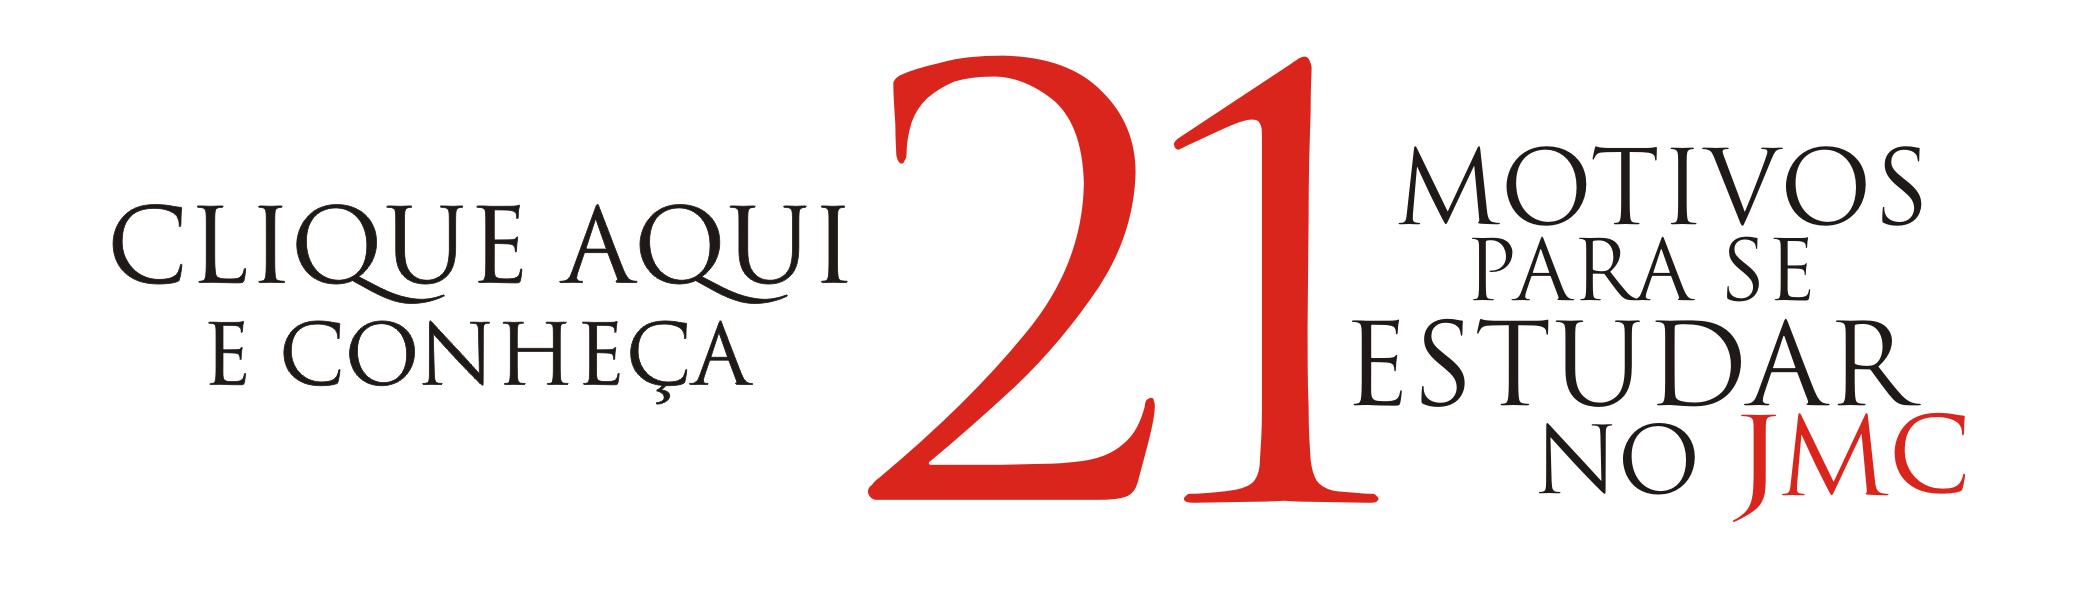 21 motivos